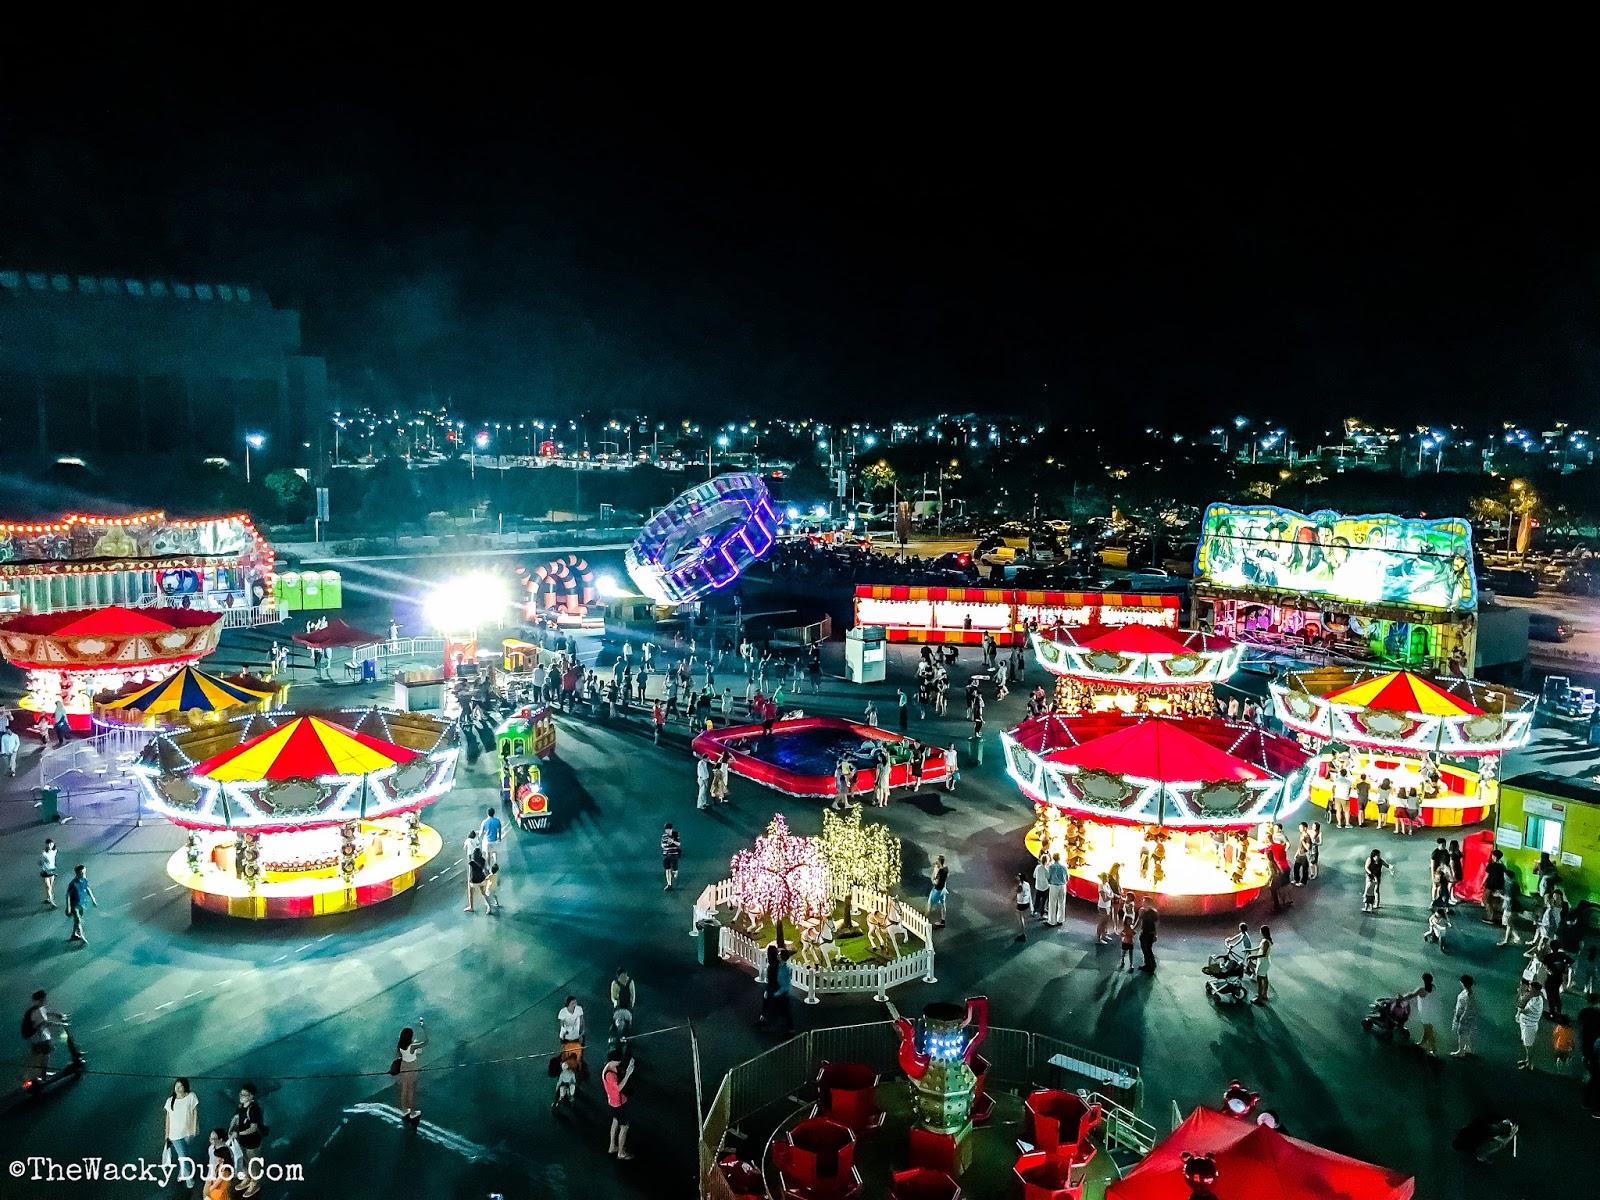 Fun Carnivals